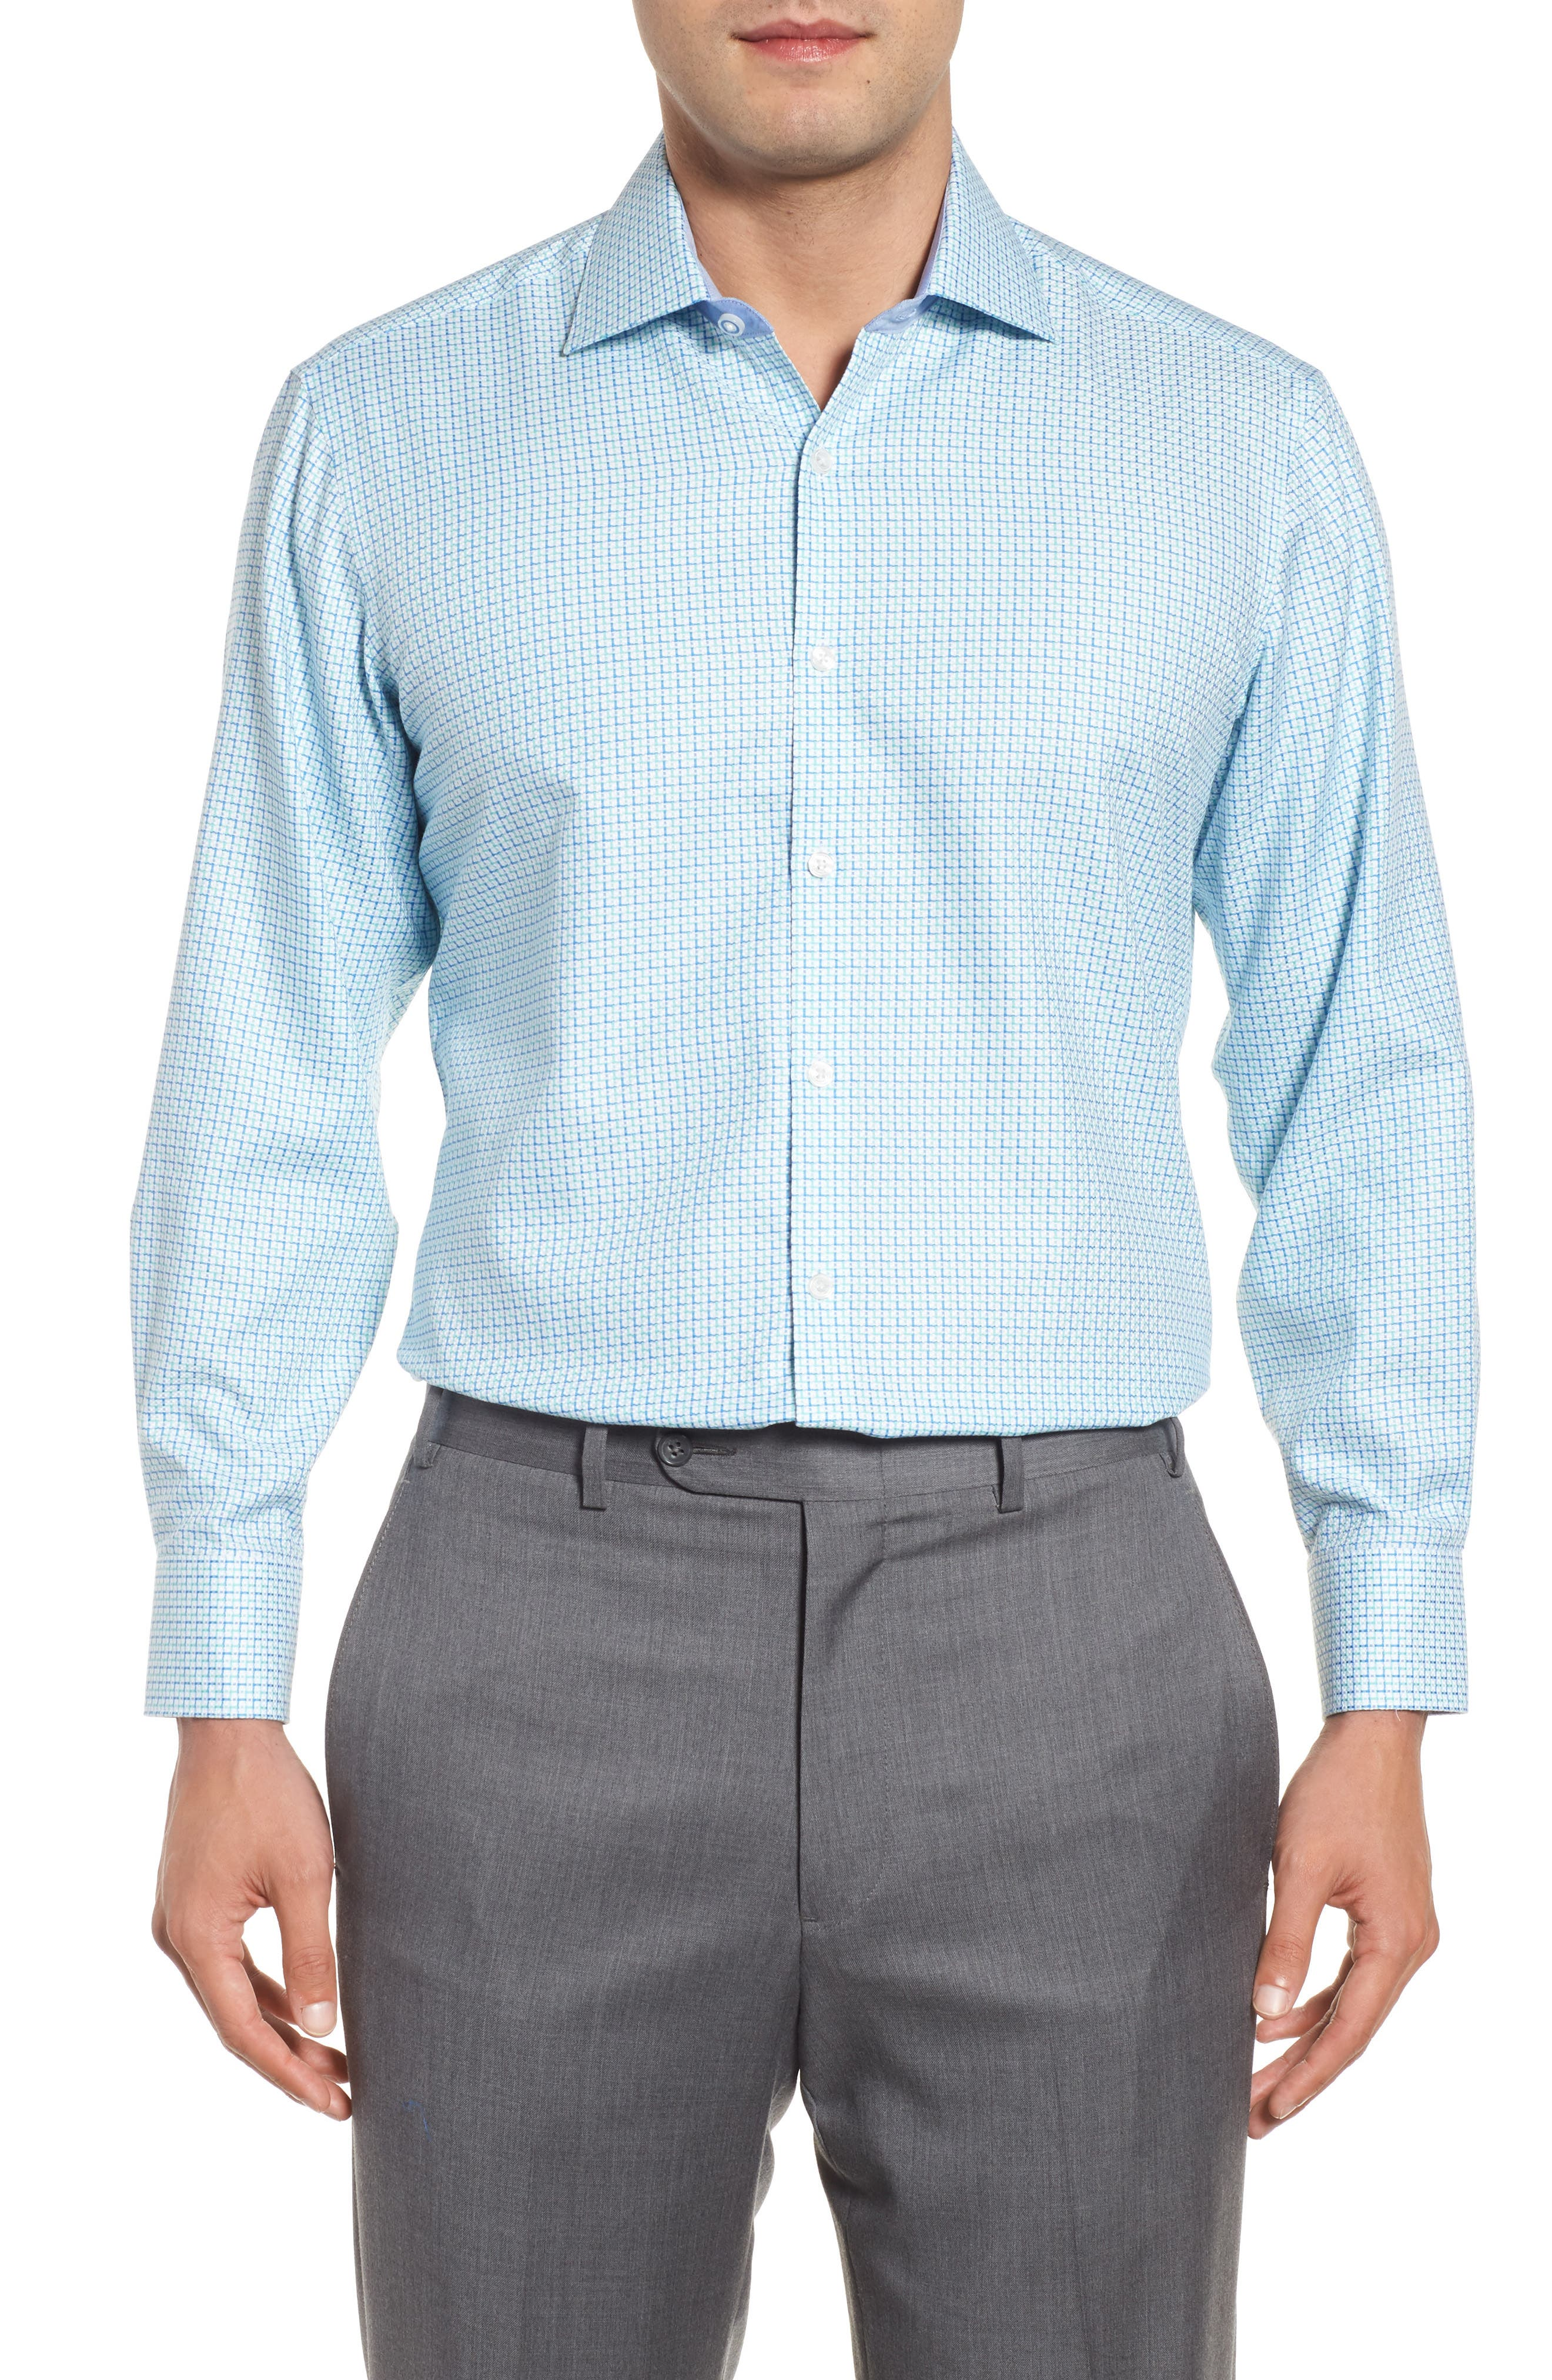 Main Image - TailorByrd Trim Fit Geometric Dress Shirt